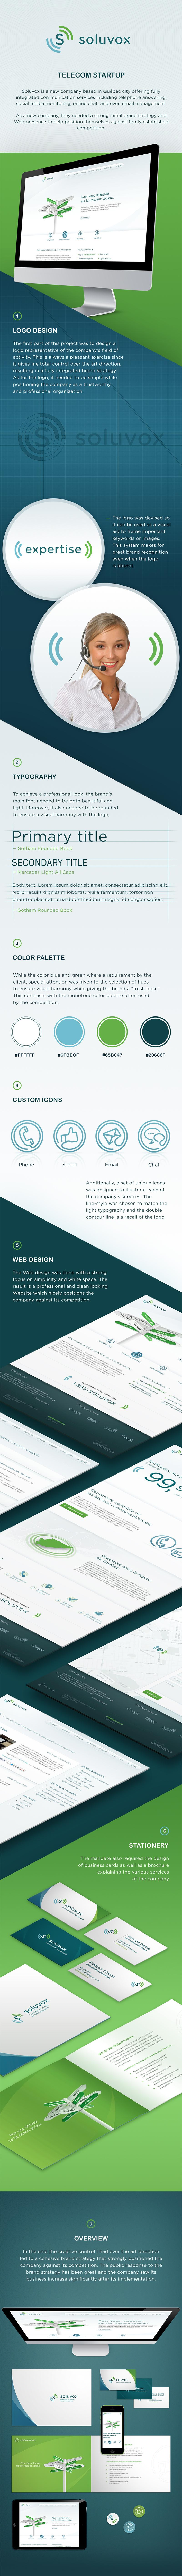 soluvox_presentation